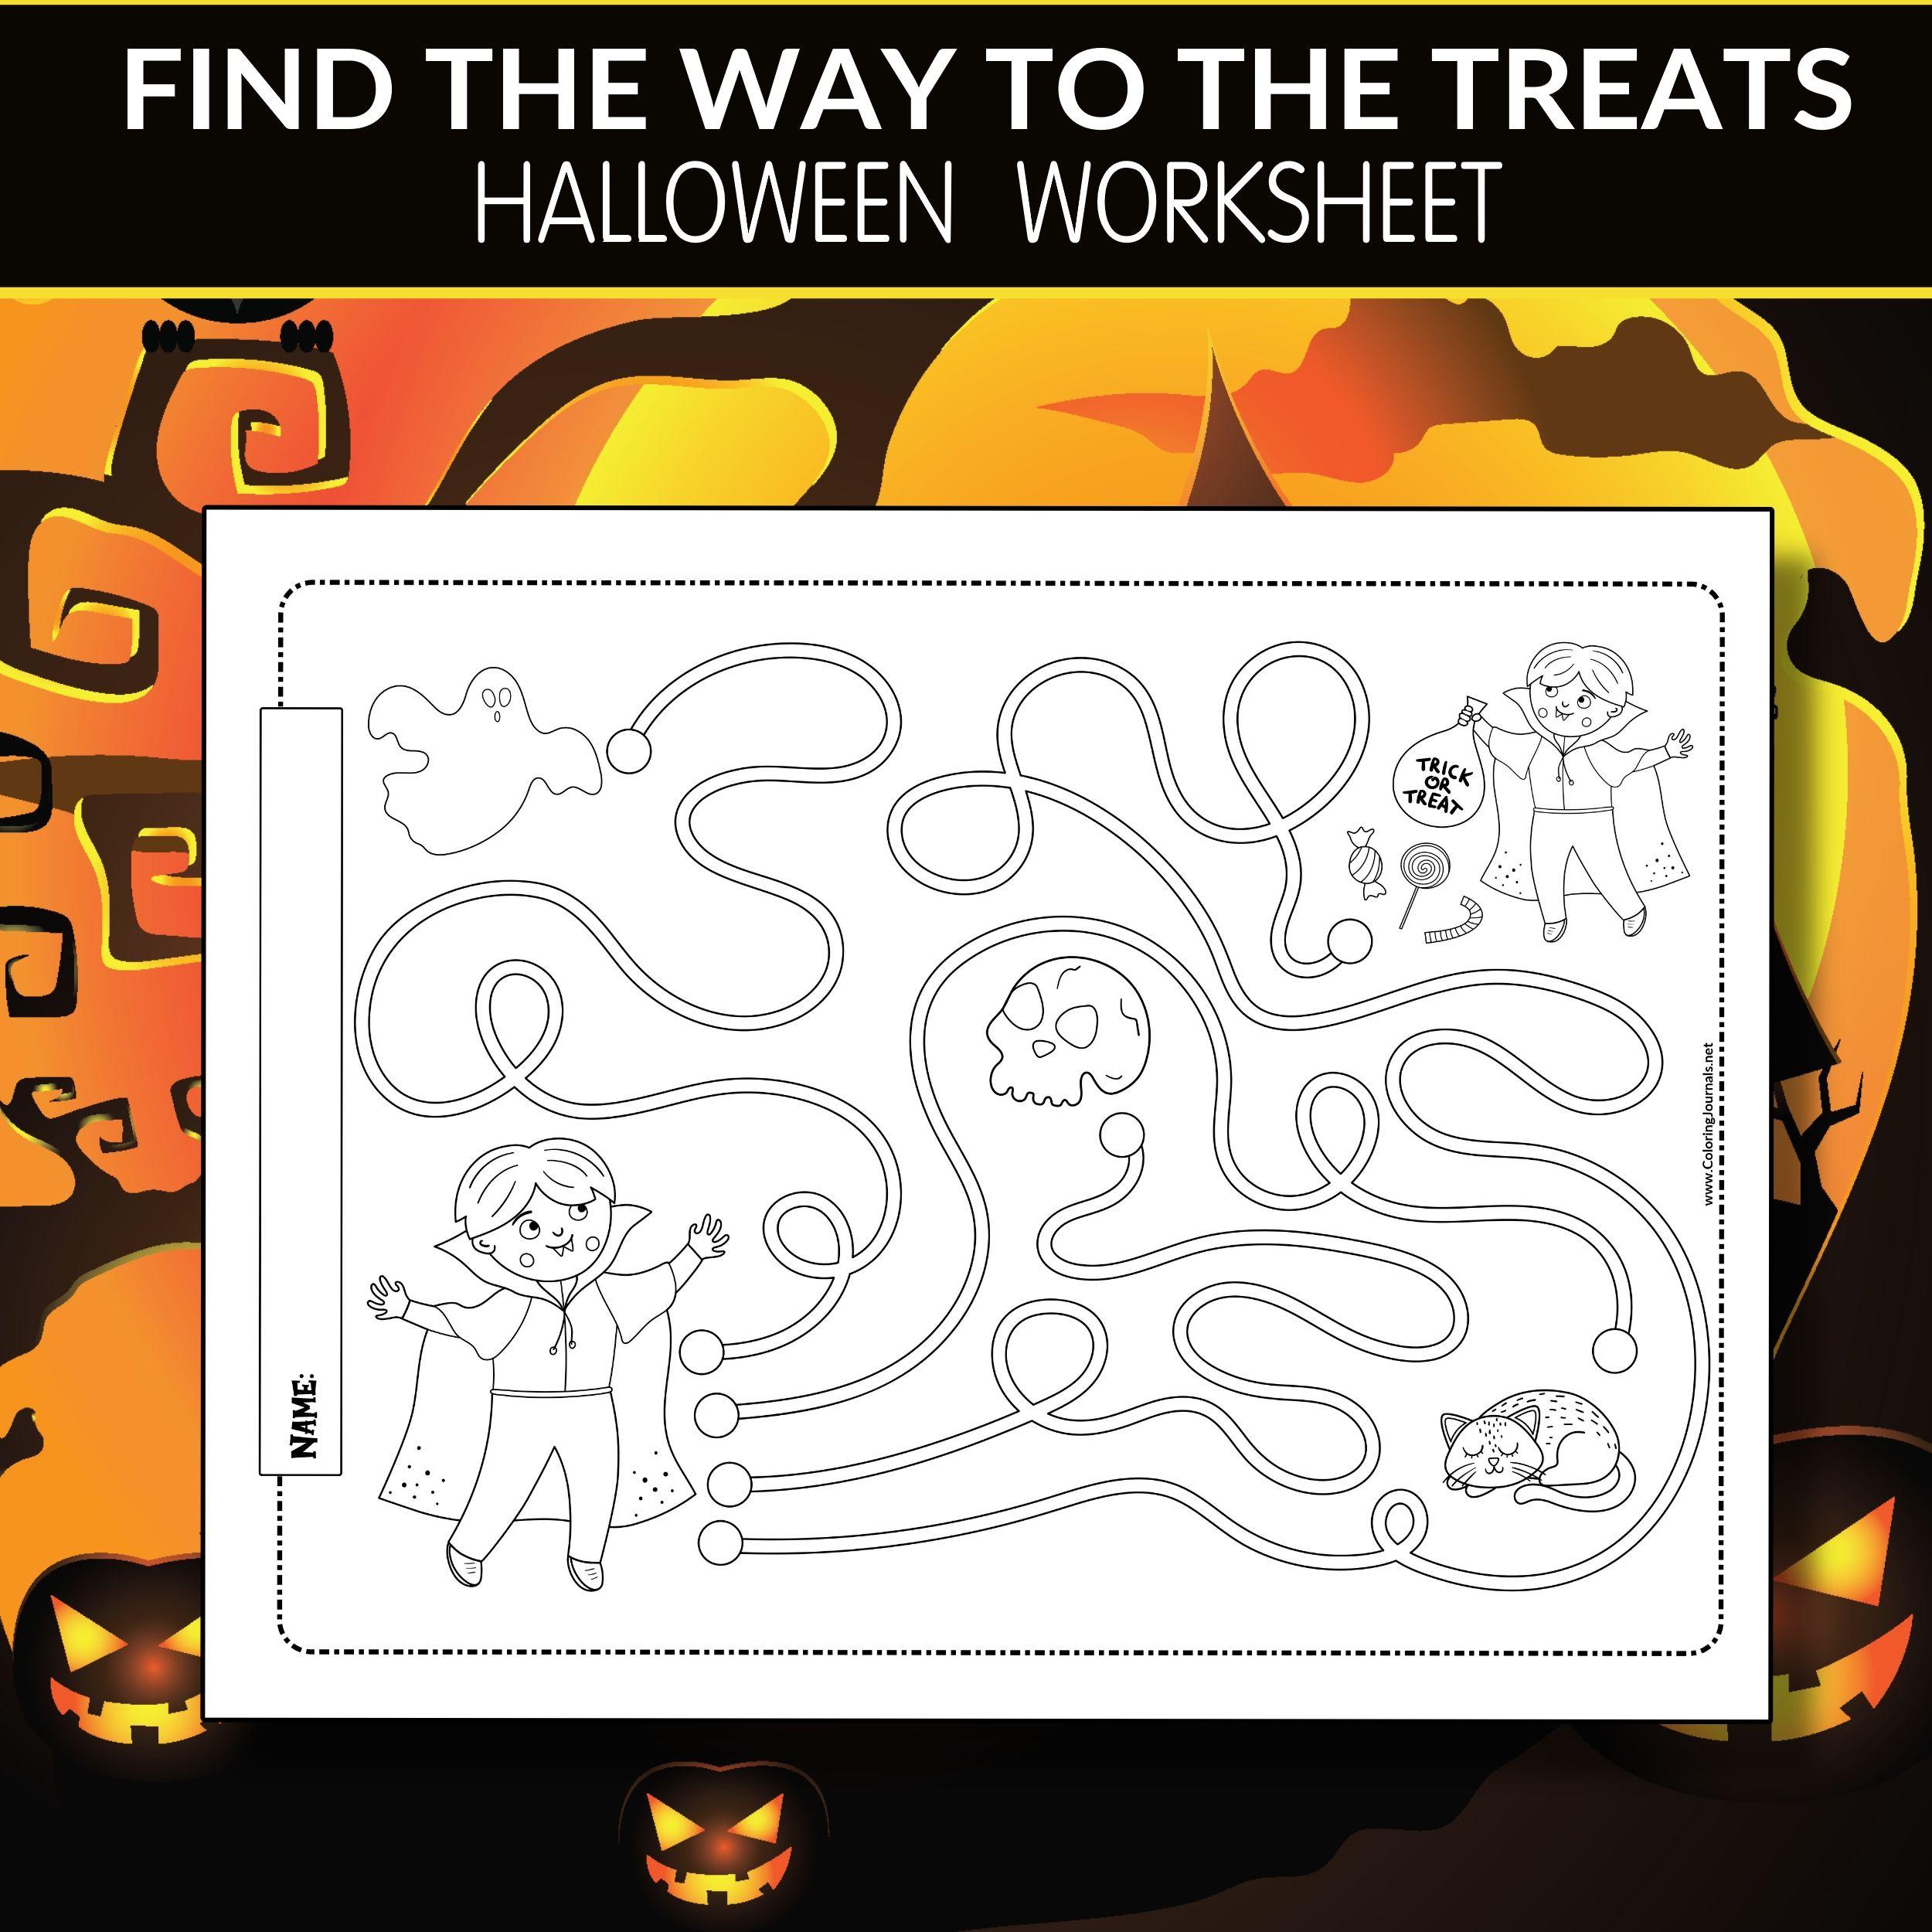 Halloween Activity Worksheet Find The Way To The Treats Halloween Worksheets Halloween Activities Halloween Activities For Kids [ 2500 x 2500 Pixel ]